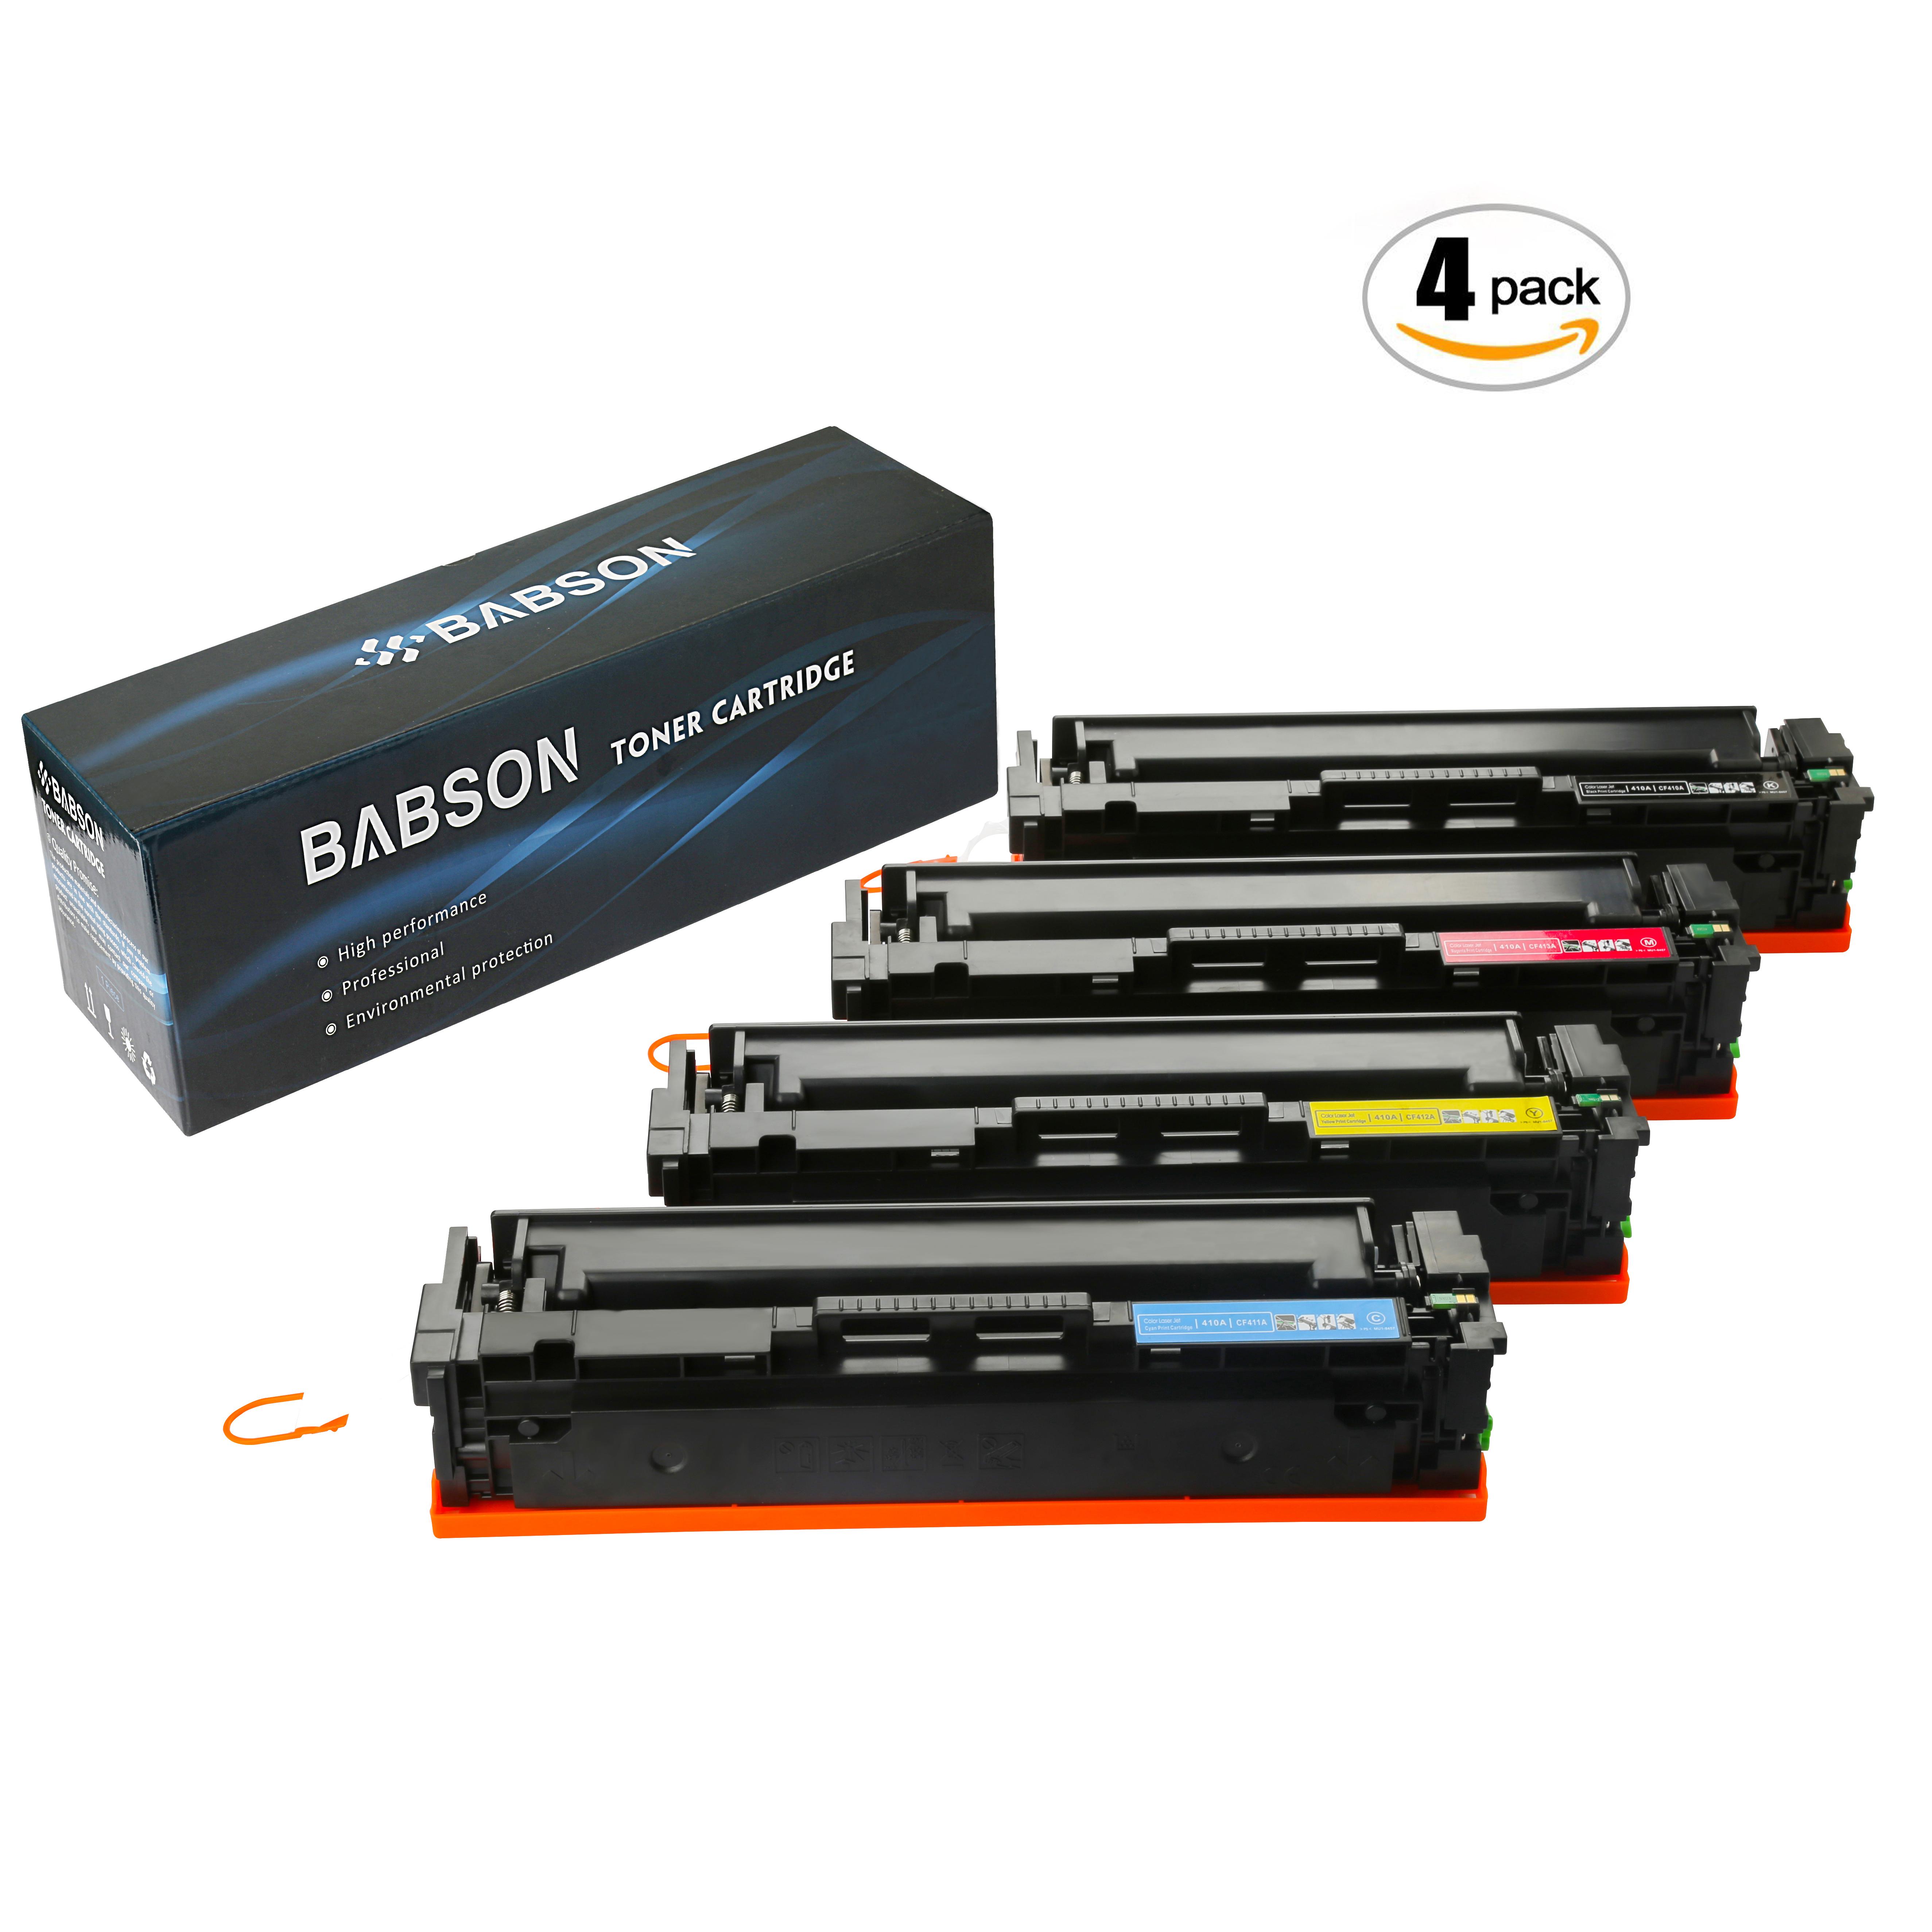 4 Pack CF400X Black Toner Cartridge For HP 201X LaserJet Pro M252dw M277dw M277n